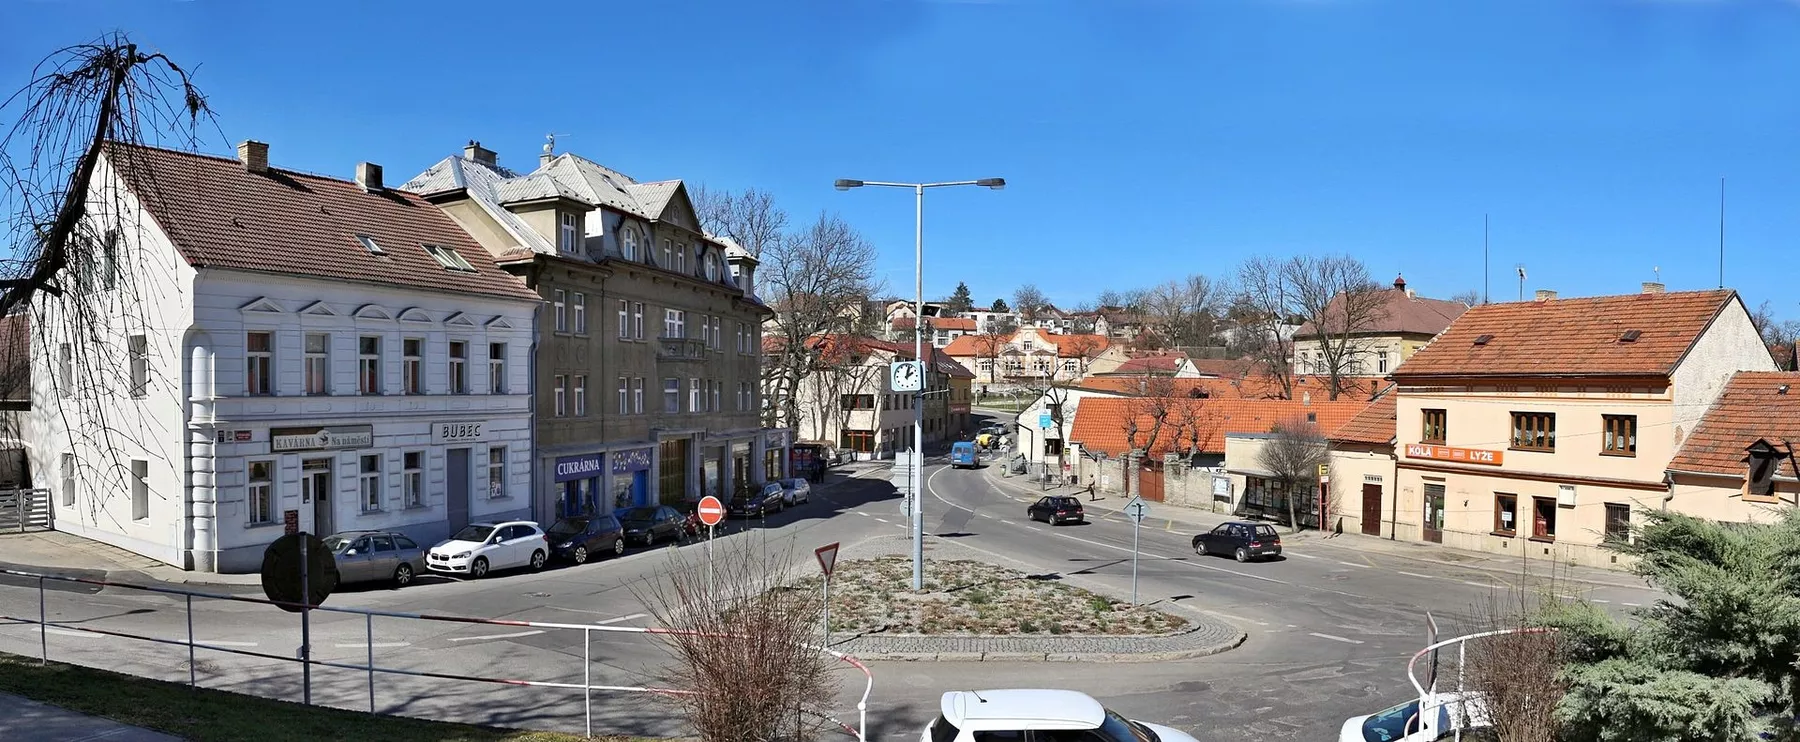 20200430-В Праге установлена памятная доска «власовцам»-pic02